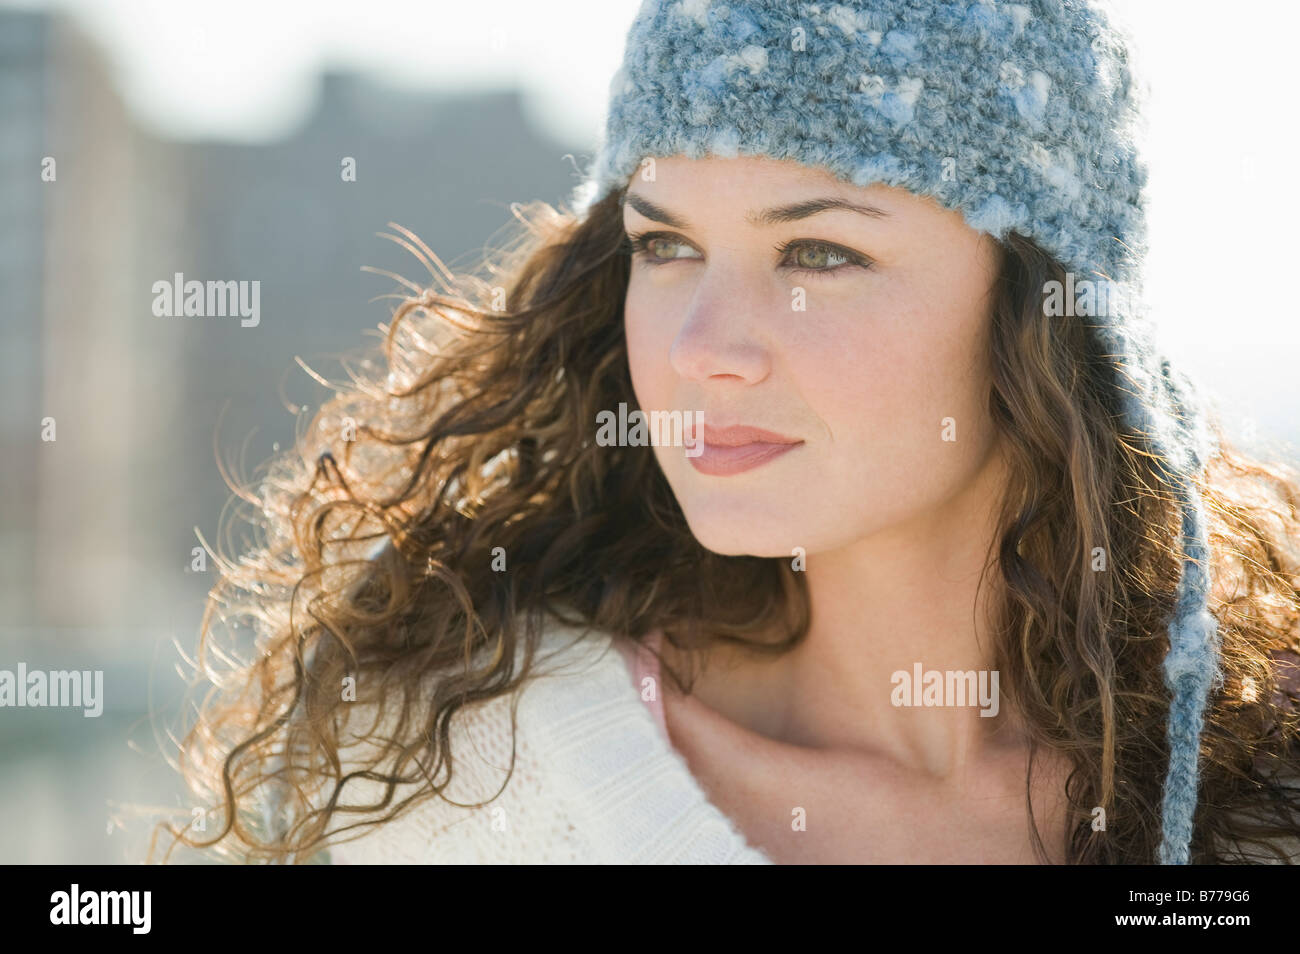 Close up of woman stocking cap - Stock Image